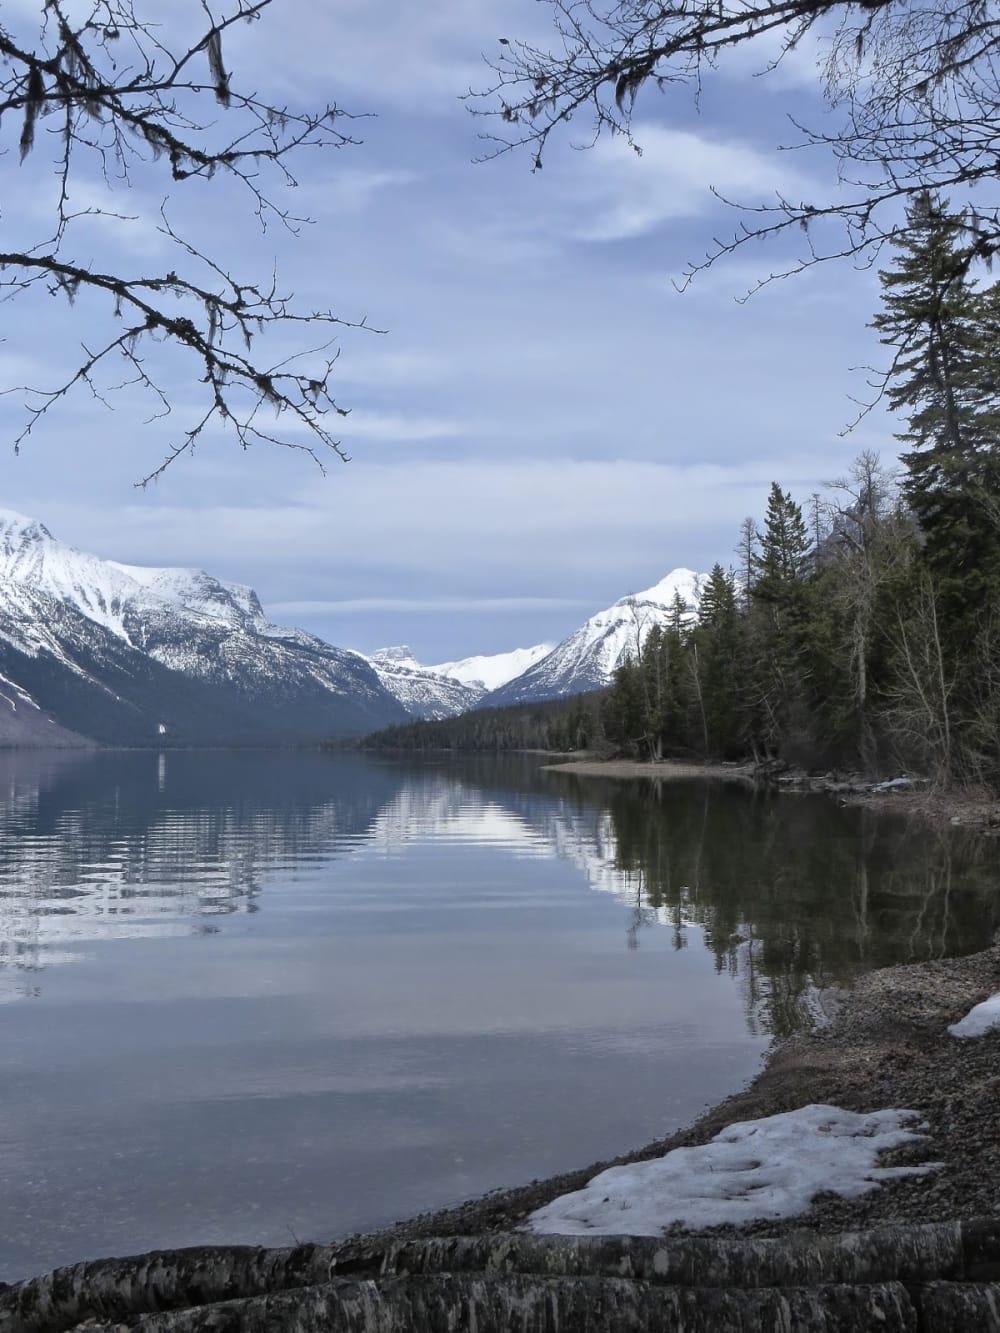 Glacier National Park, Majestic Natural Beauty, 2.5 hrs NorthEast from Bear Spirit Lodge B&B